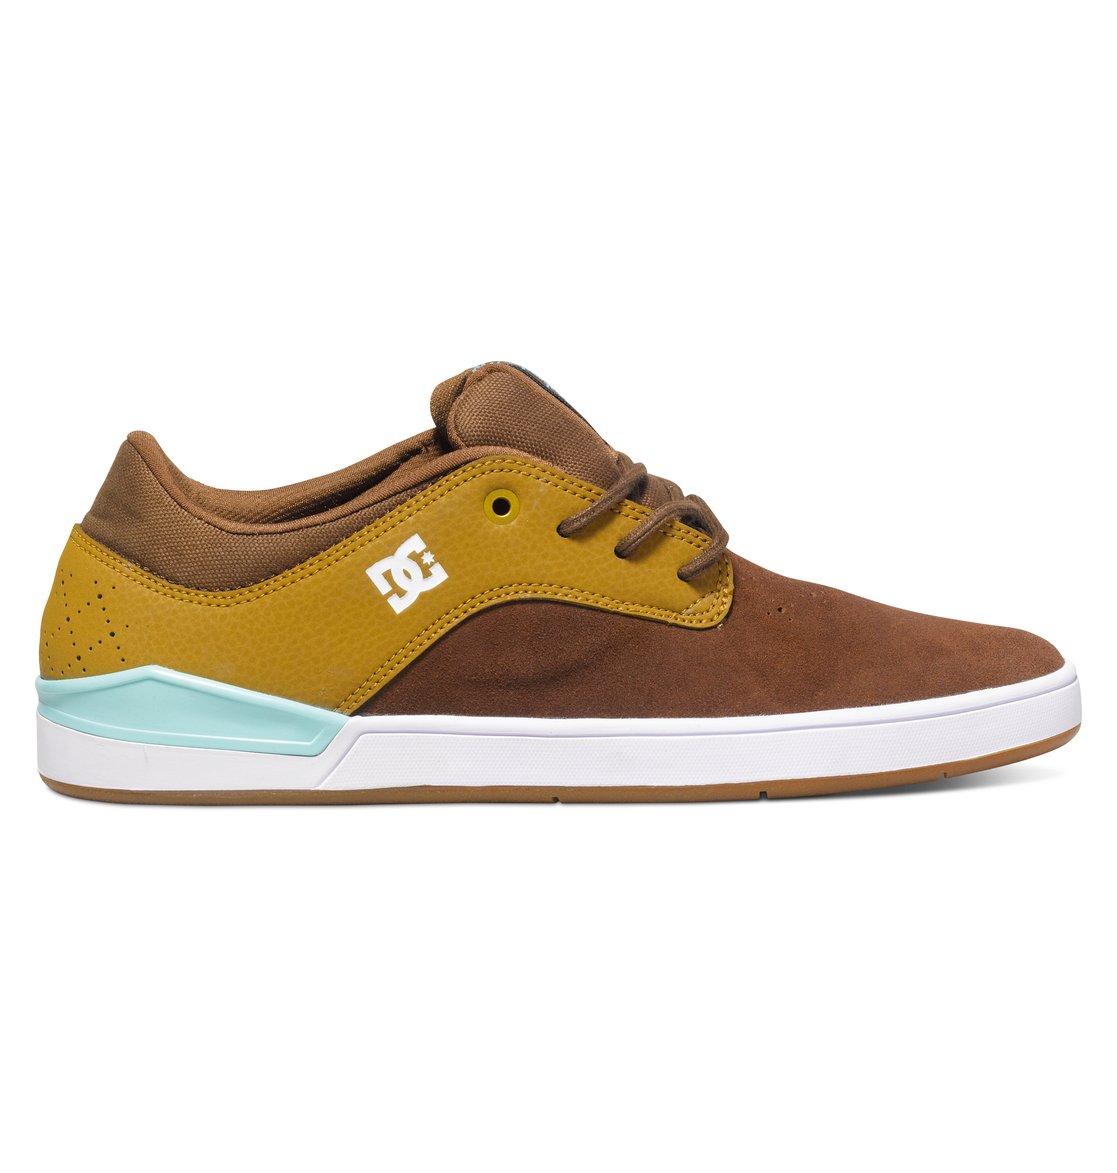 Best online shoes shop europe